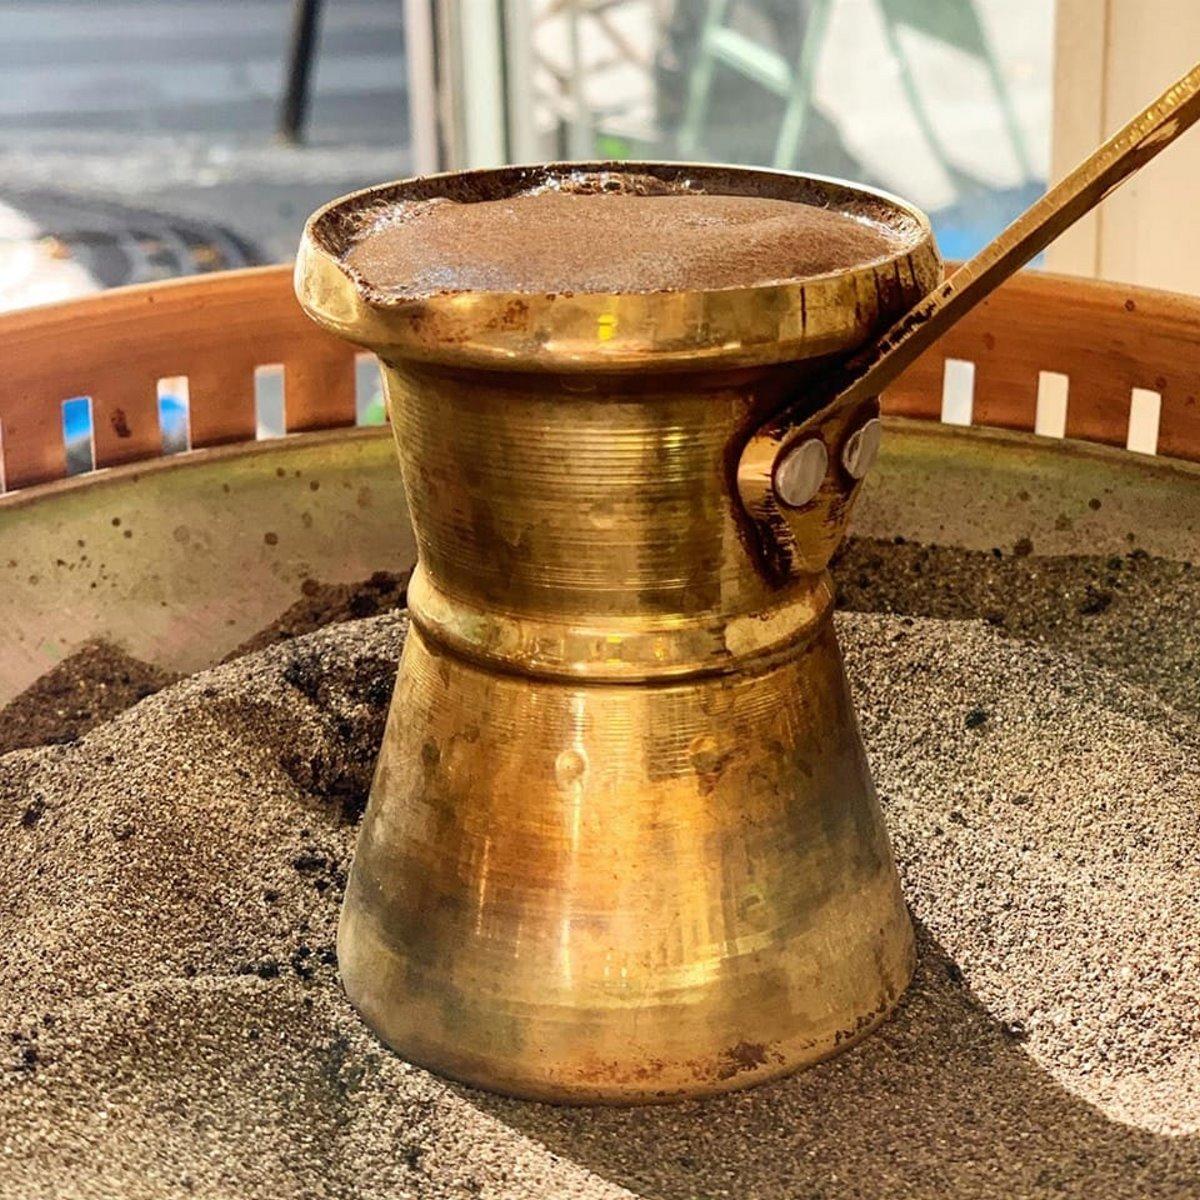 Yorgaki καφέ στο παρίσι παραδοσιακός ελληνικός καφές στη χόβολη